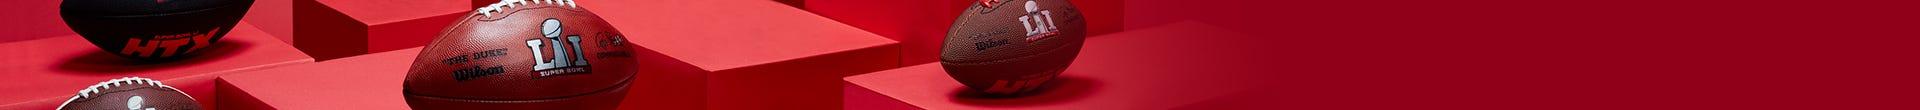 Wilson Super Bowl LI